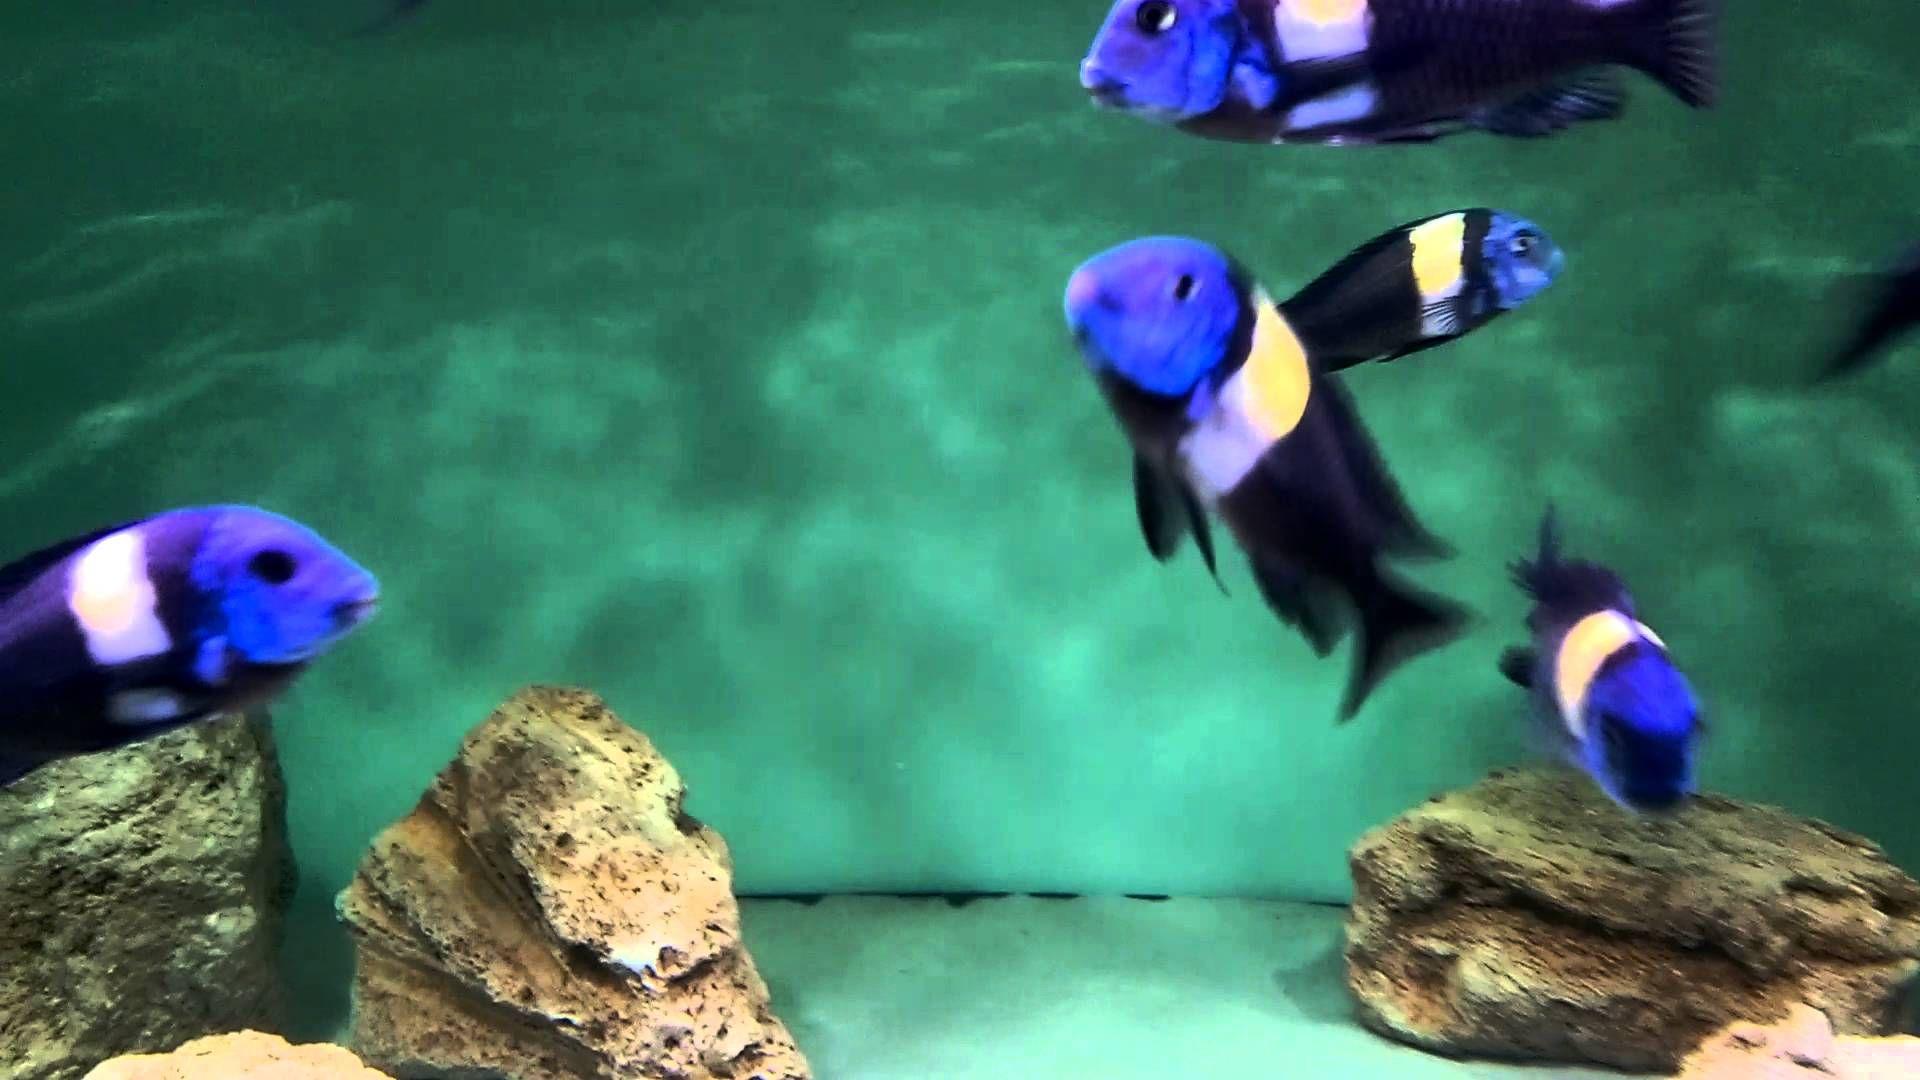 0d7f918fa7b790610ba10960a3b8ff29 Frais De Aquarium Tropical Schème